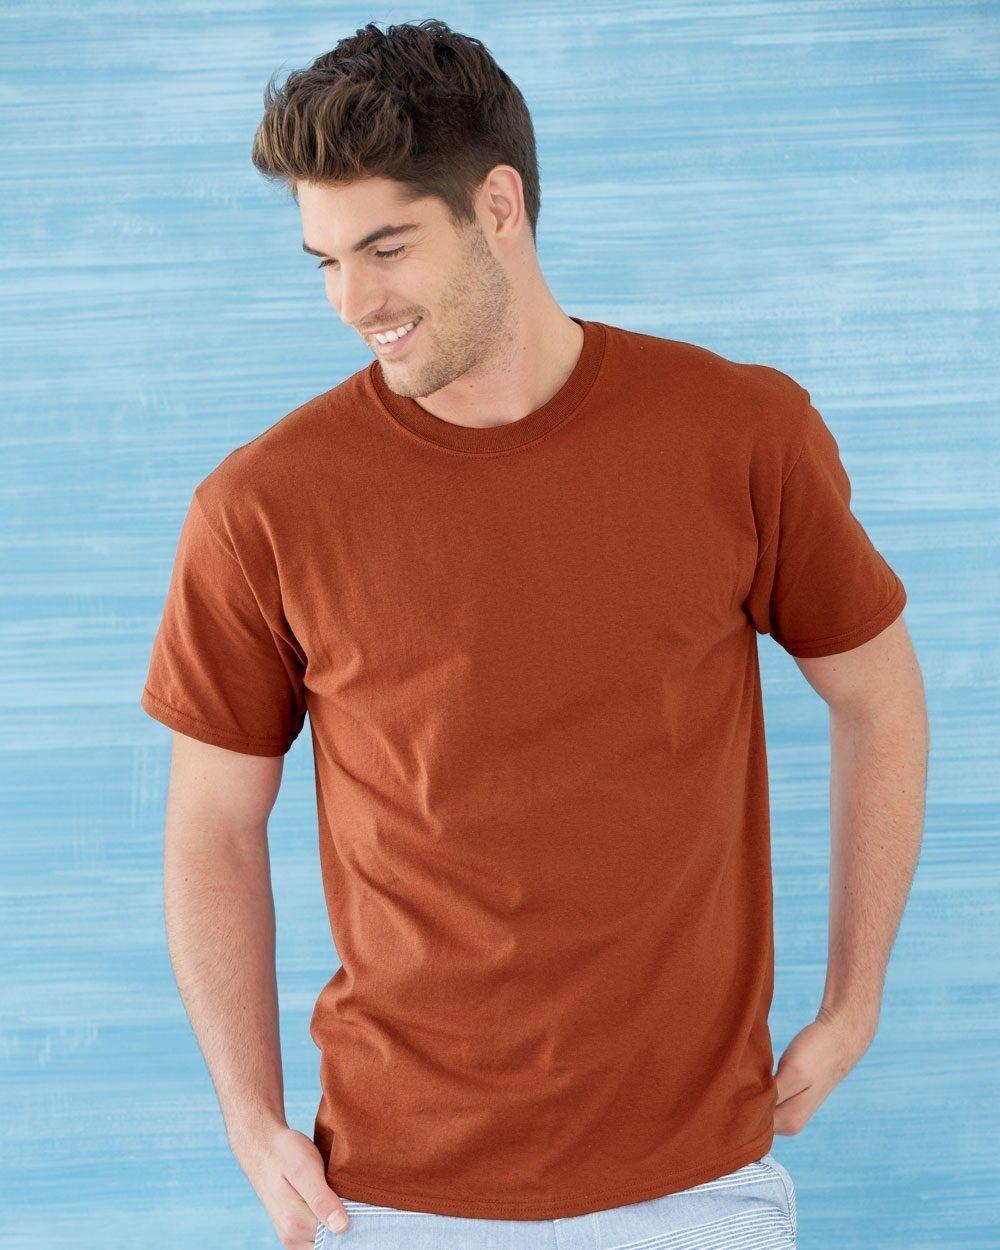 35 Gildan Heavy Cotton T-Shirt Lot Wholesale Bulk Lot T-Shirt ok to mix S-XL & Colors tees 25b0e5